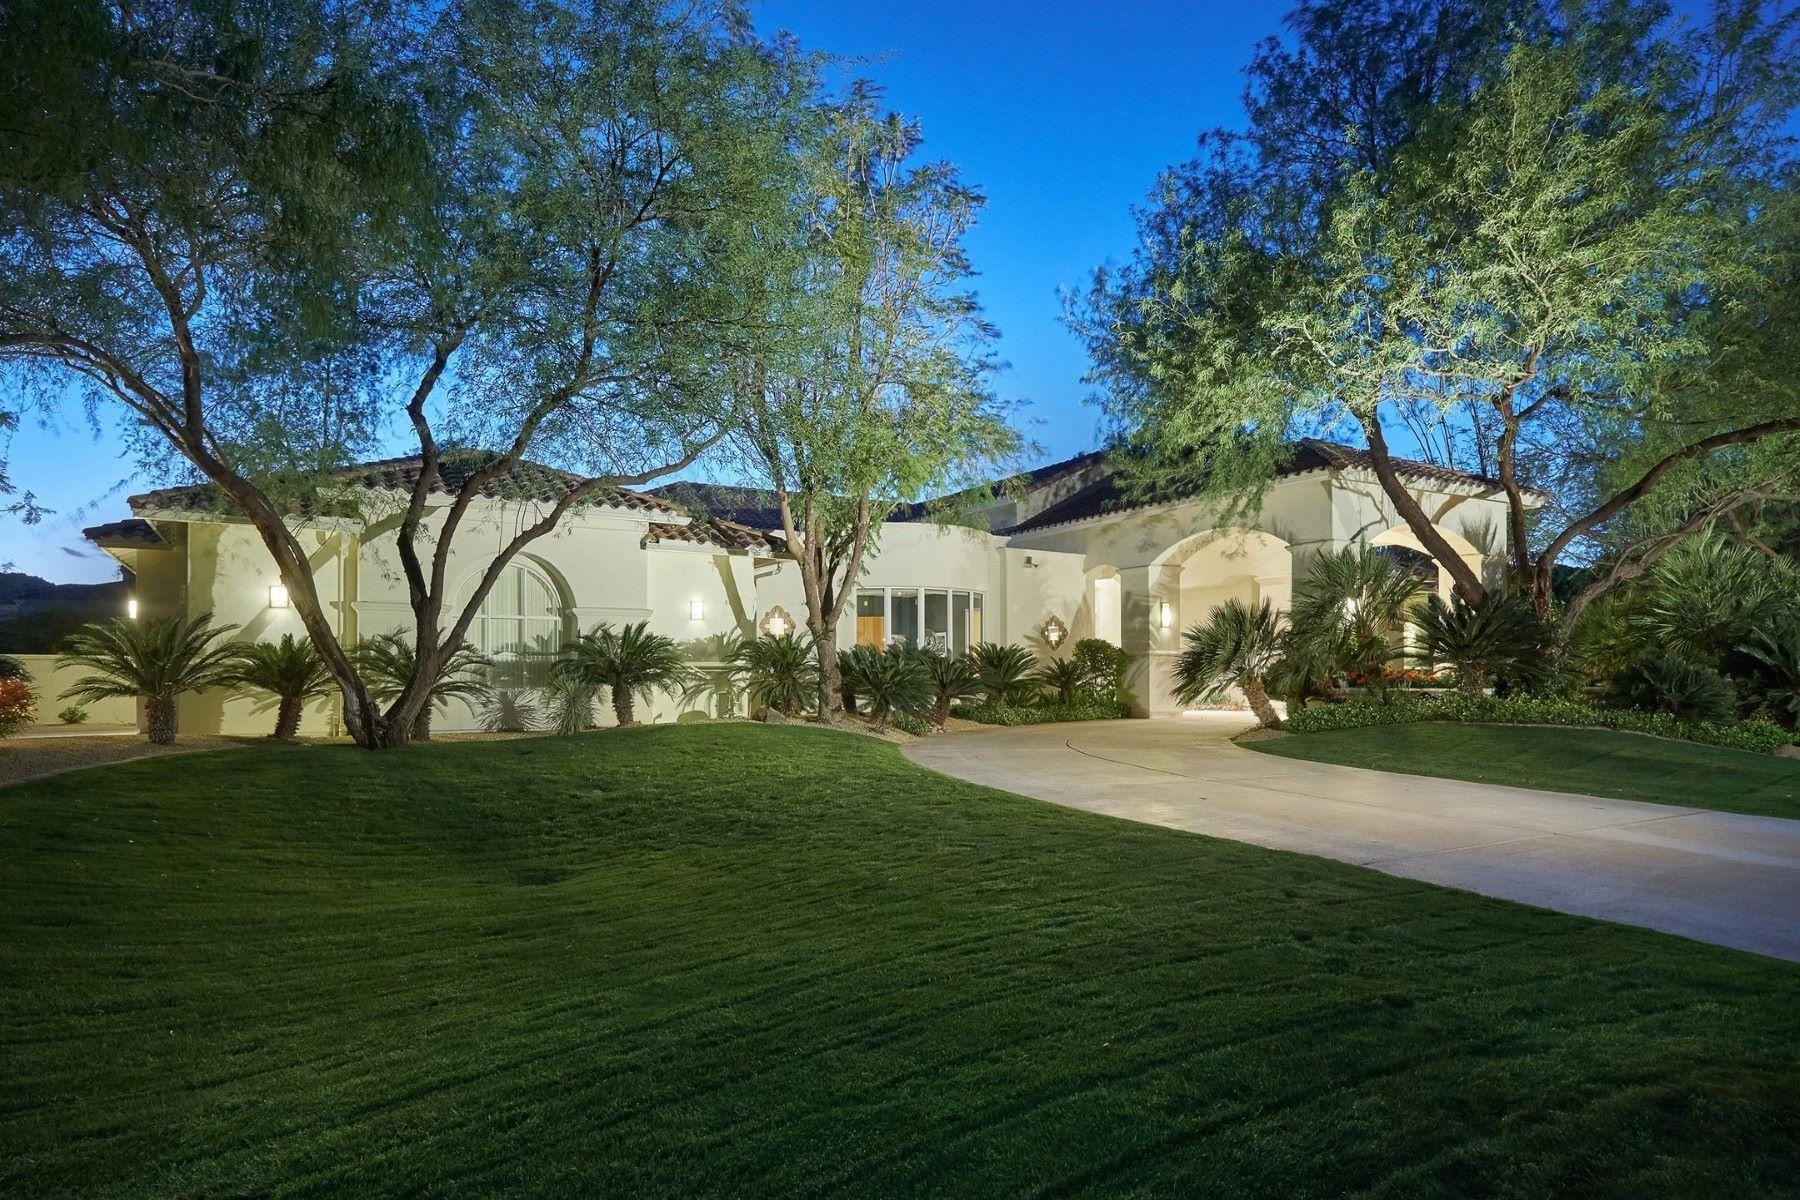 Tek Ailelik Ev için Satış at Newest and only listing in the exclusive guard gated Cheney Estates 7560 N 71st St Paradise Valley, Arizona, 85253 Amerika Birleşik Devletleri